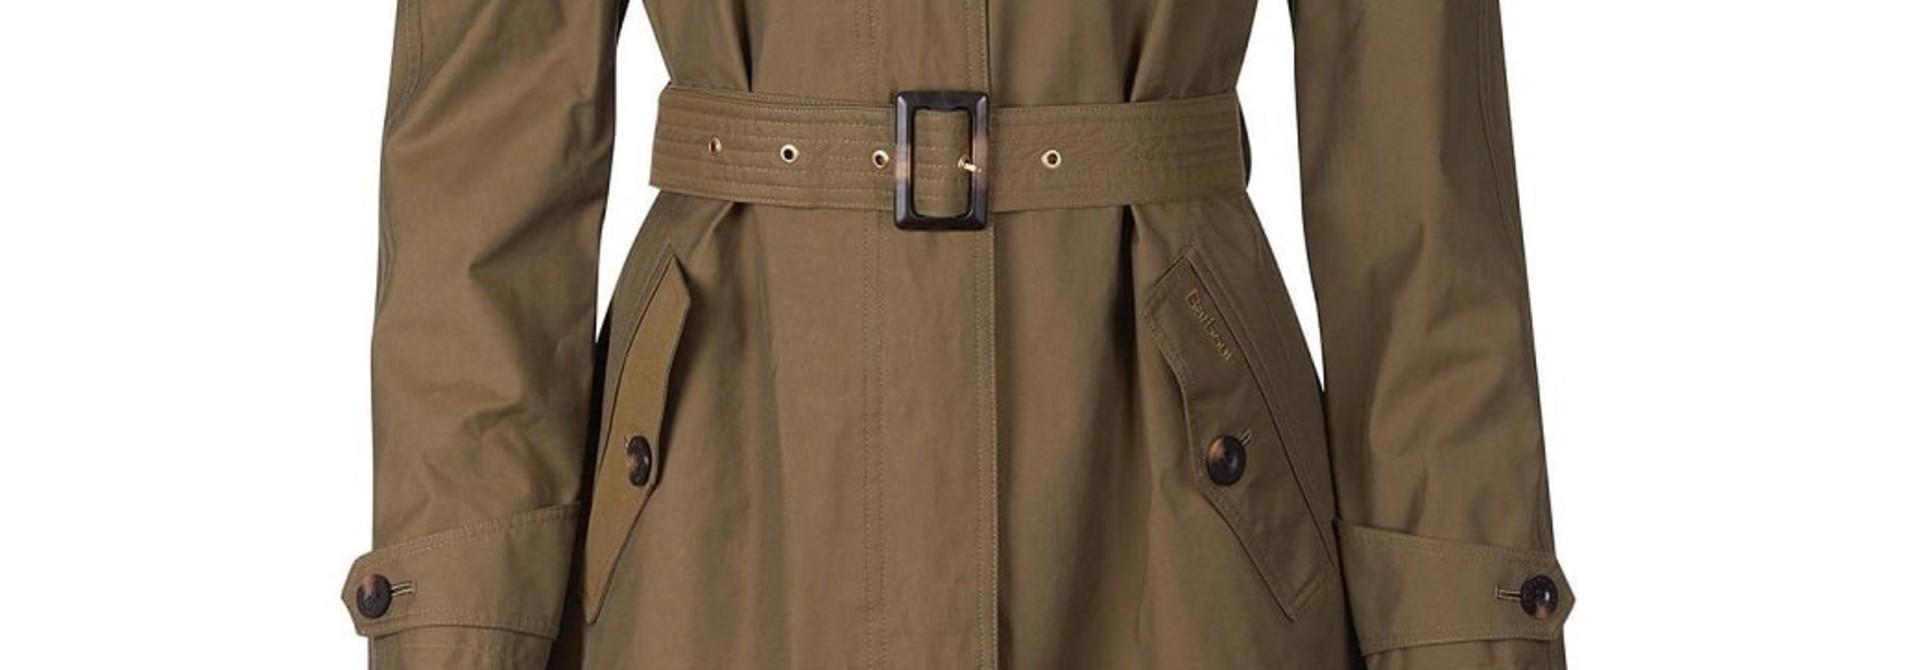 Barbour Brunswick Waterproof Jacket Olive-Olive Mist Tartan